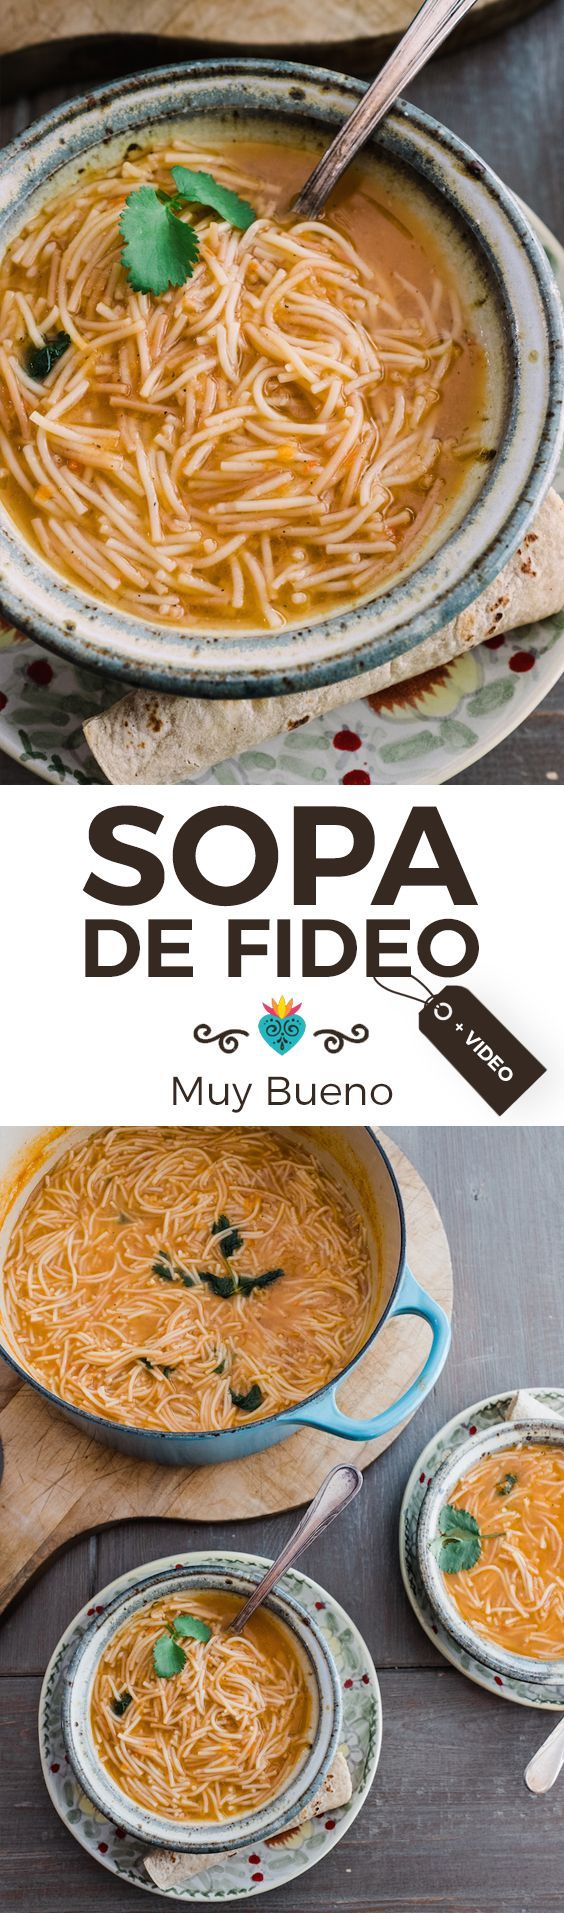 Sopa de Fideo + Video